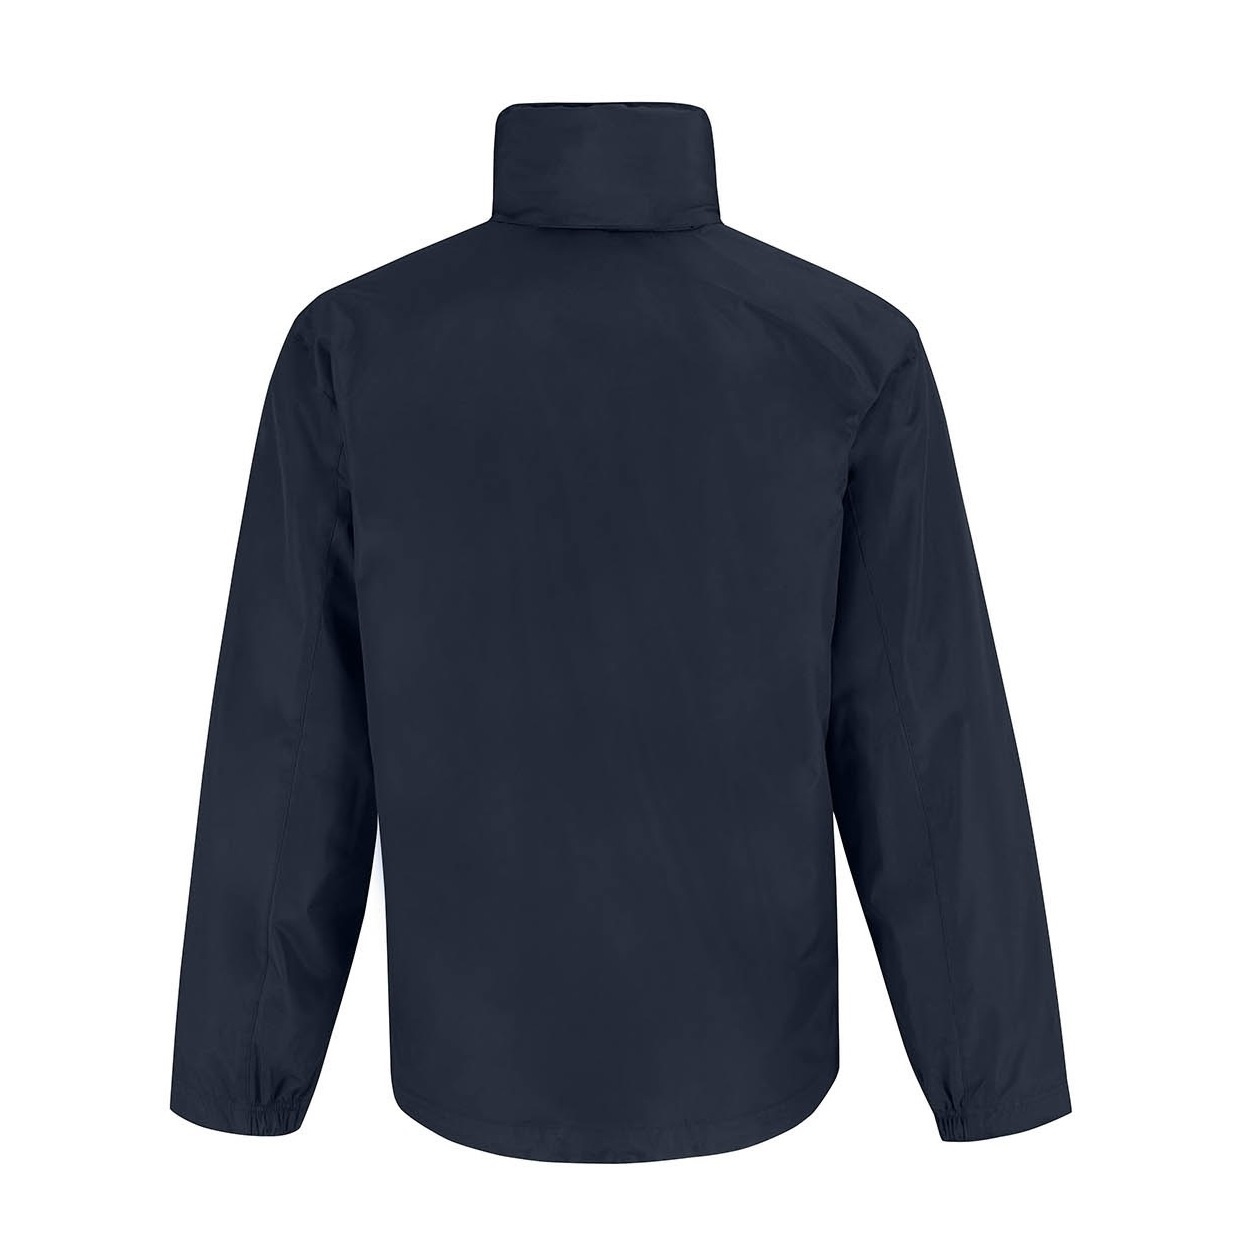 B&C Mens Corporate 3-In-1 Hooded Parka Jacket (M) (Black)